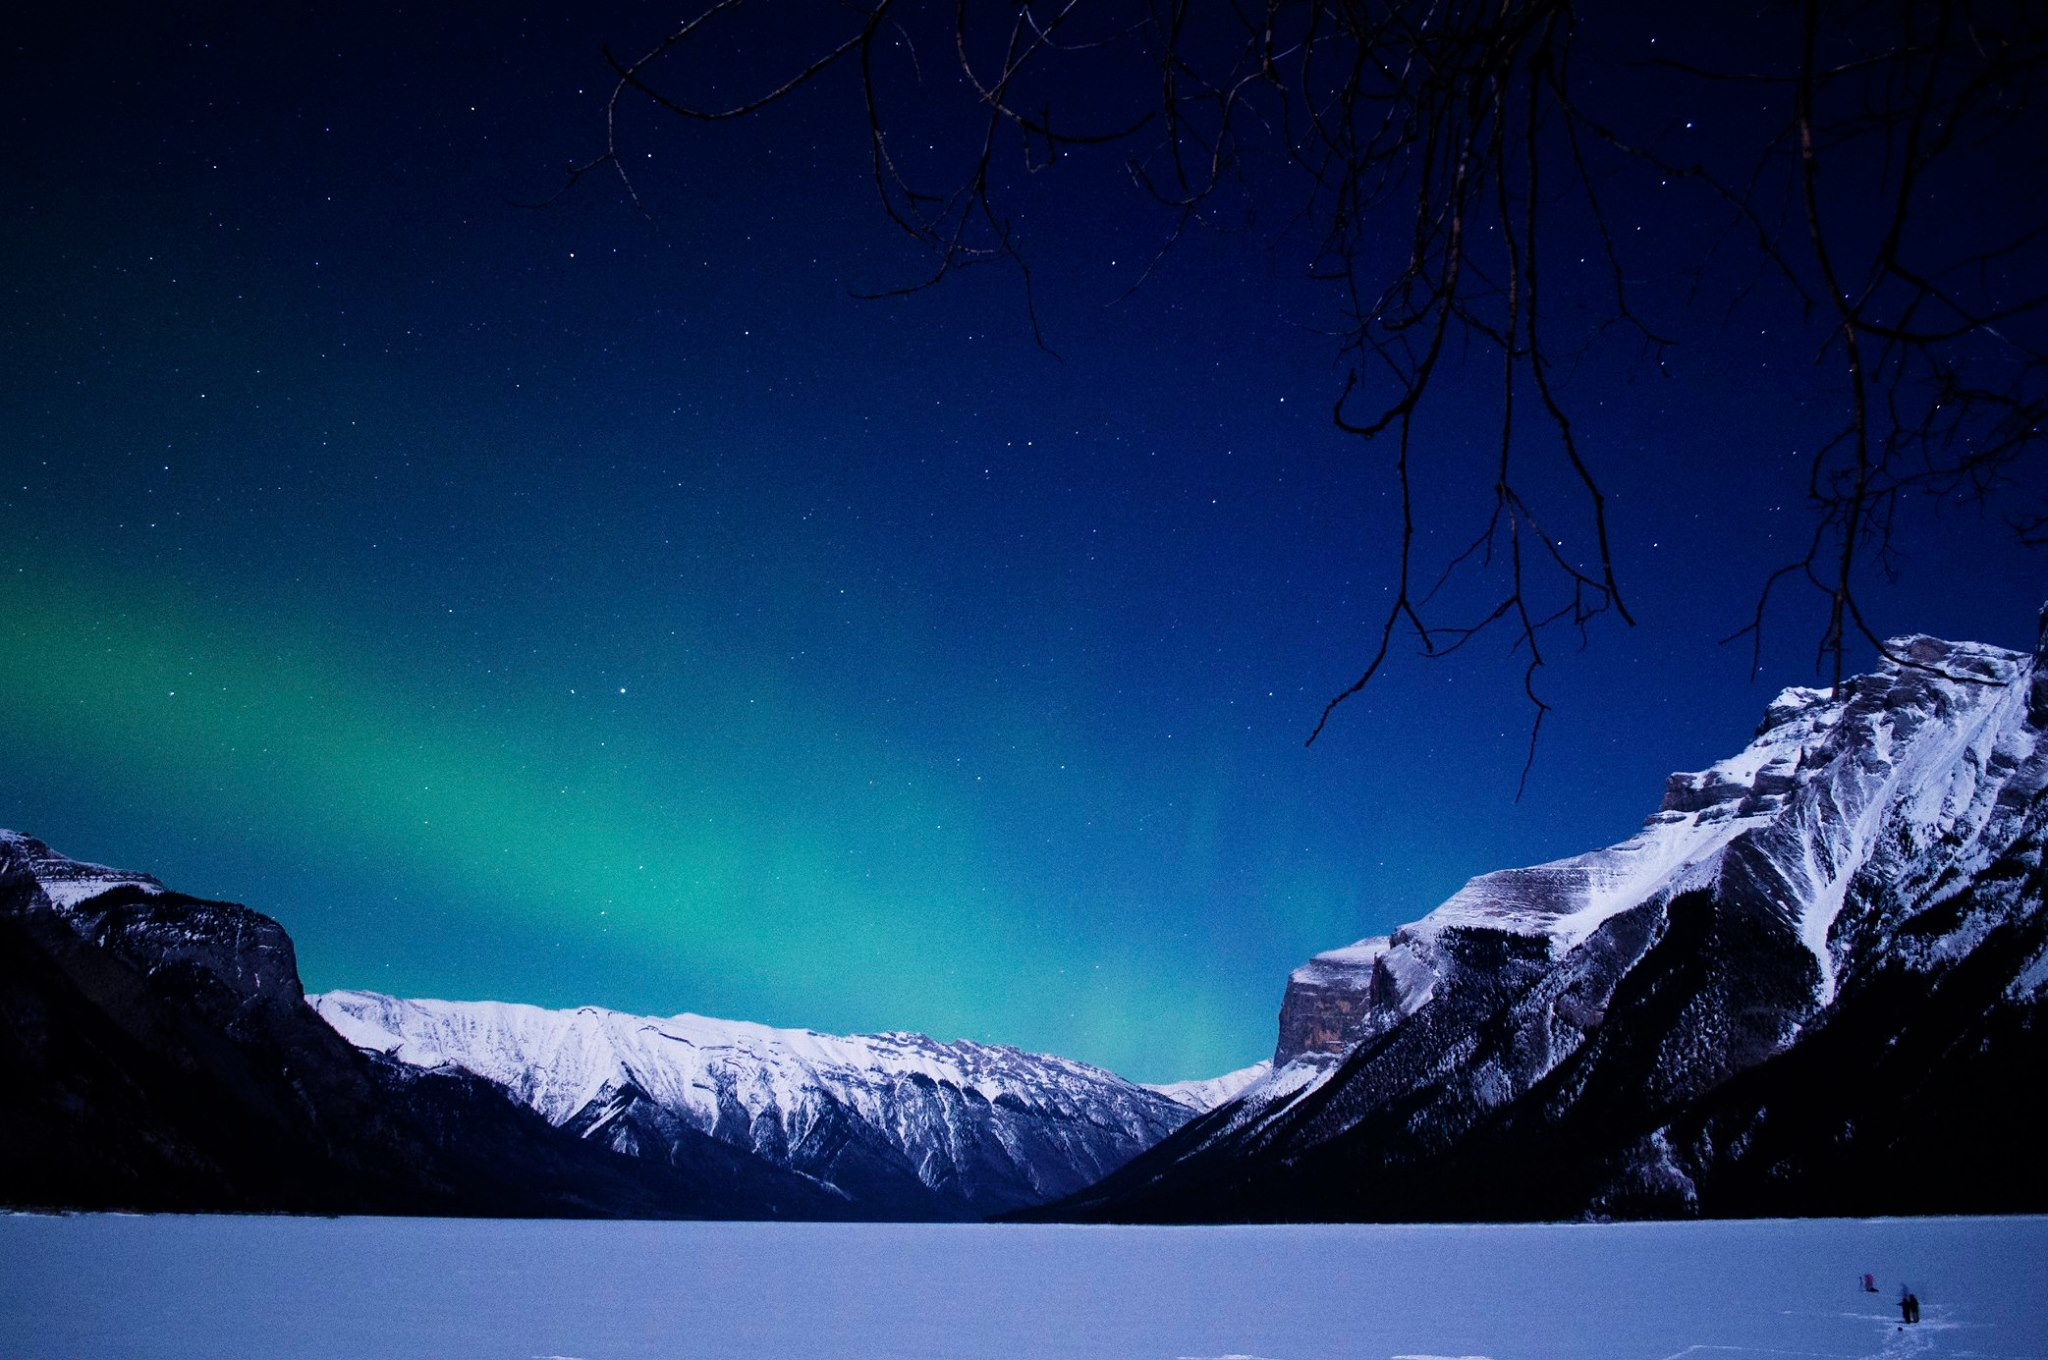 Aurora Borealis at Lake Minnewanka, Banff National Park.